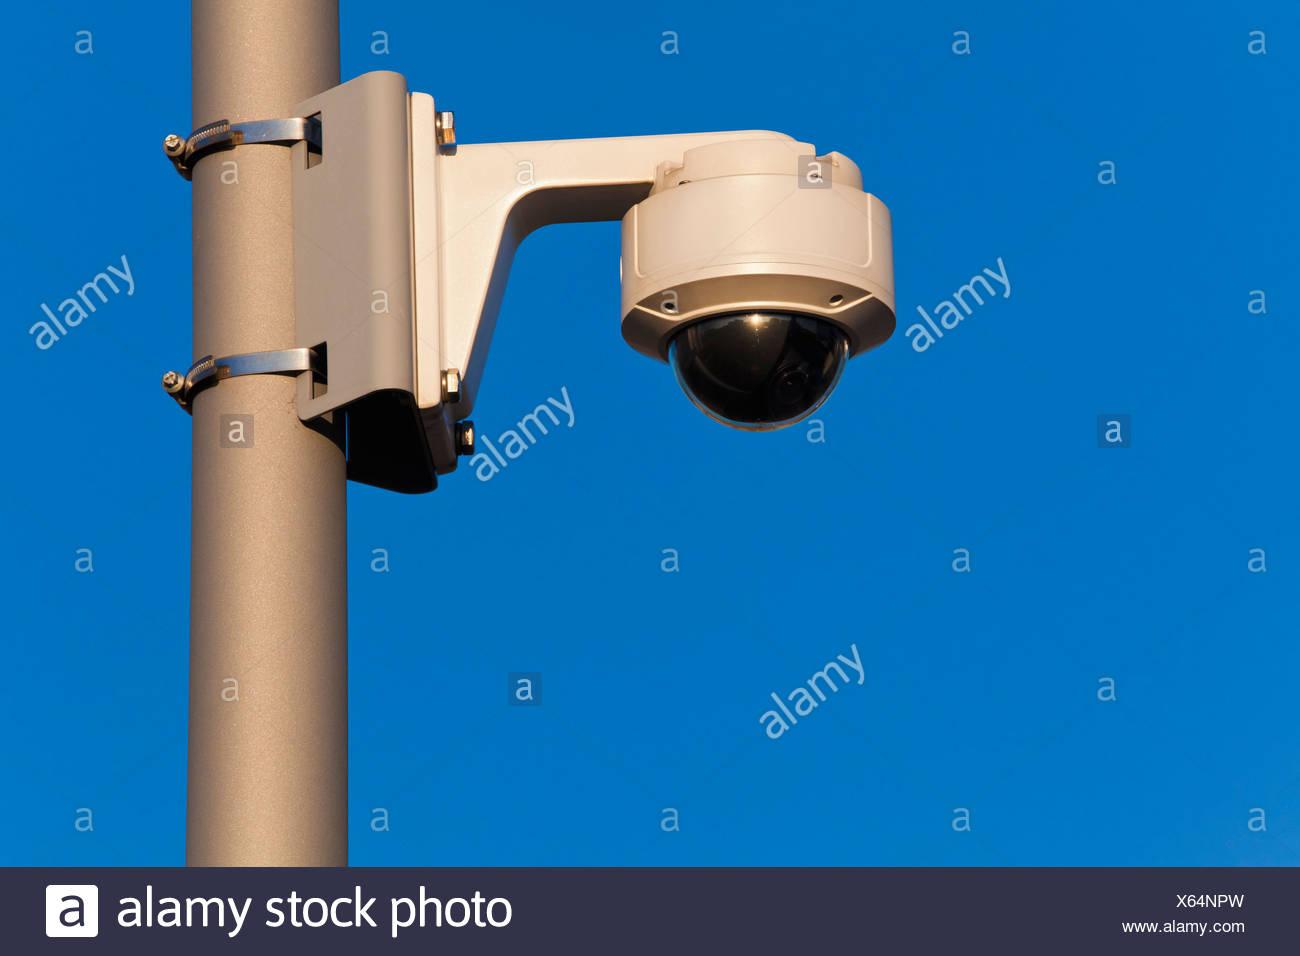 Germany, Baden Wuerttemberg, Stuttgart, Monitoring camera against sky, close up - Stock Image